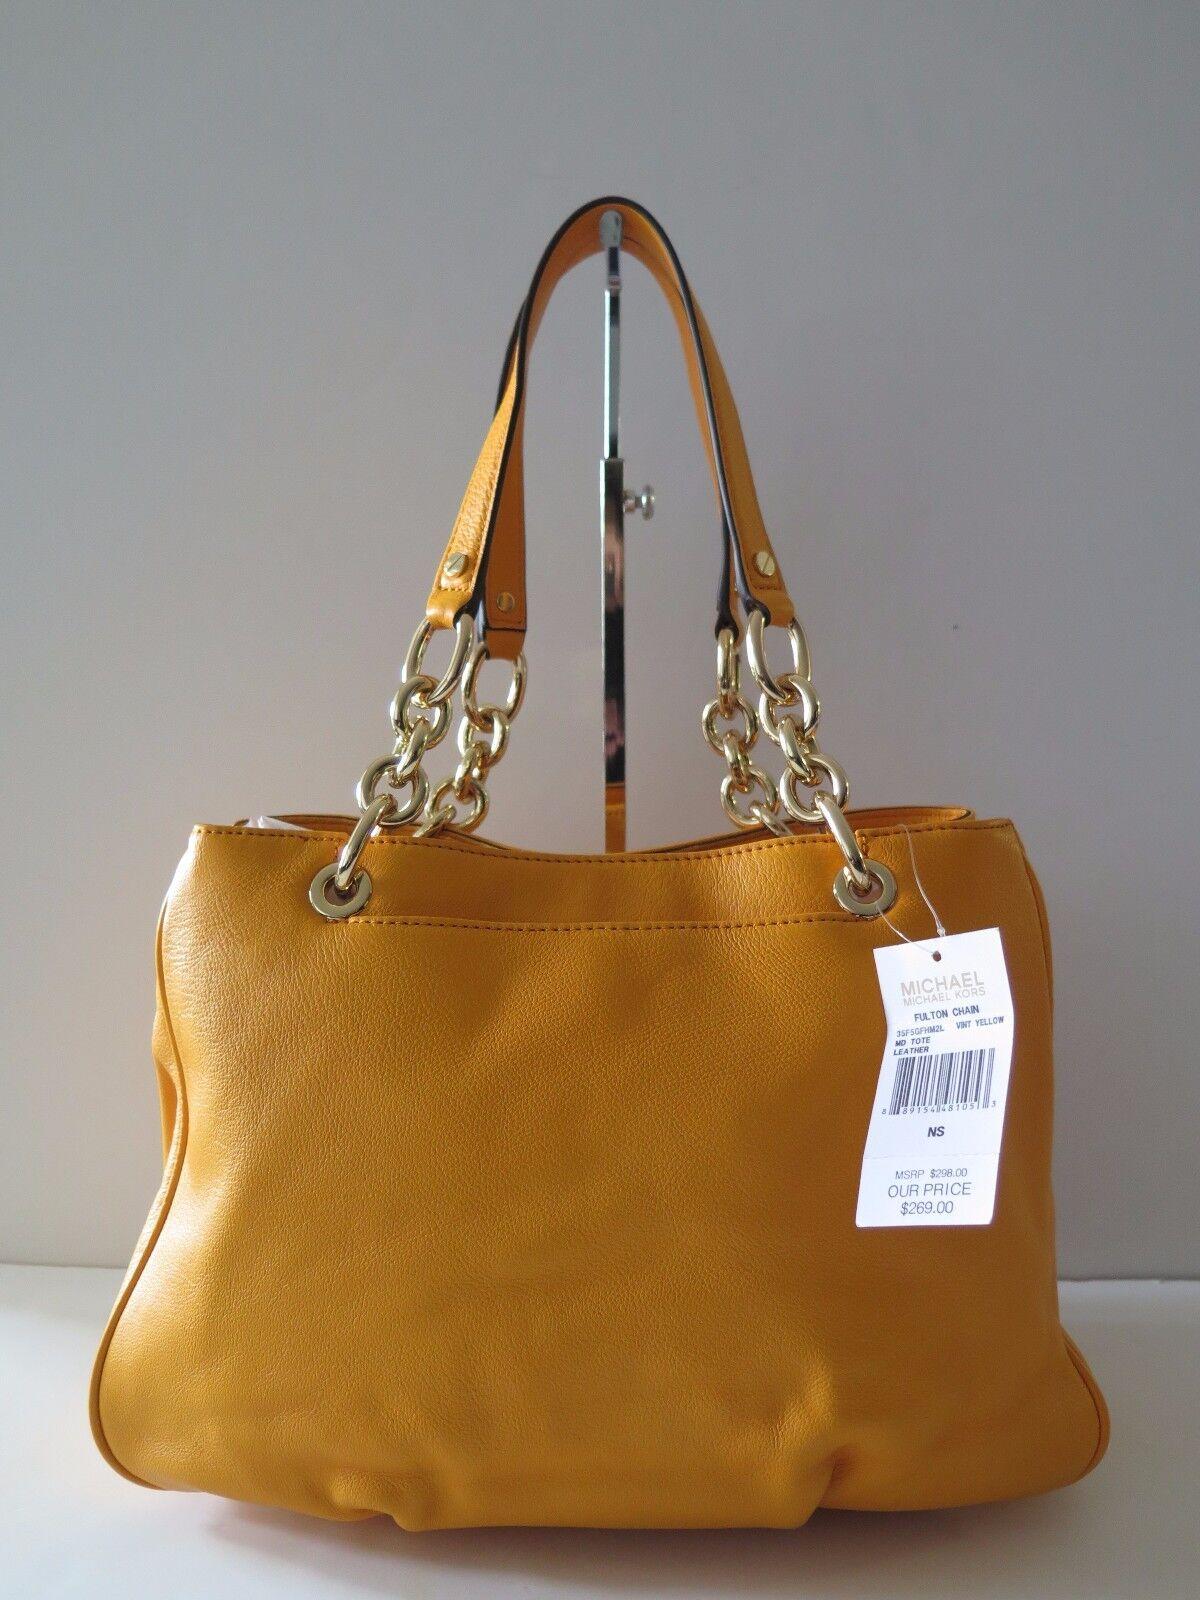 32e10d6c9549 Michael Kors Fulton Chain Medium Leather Tote 35f5gfhm2l Vintage Yellow for  sale online   eBay